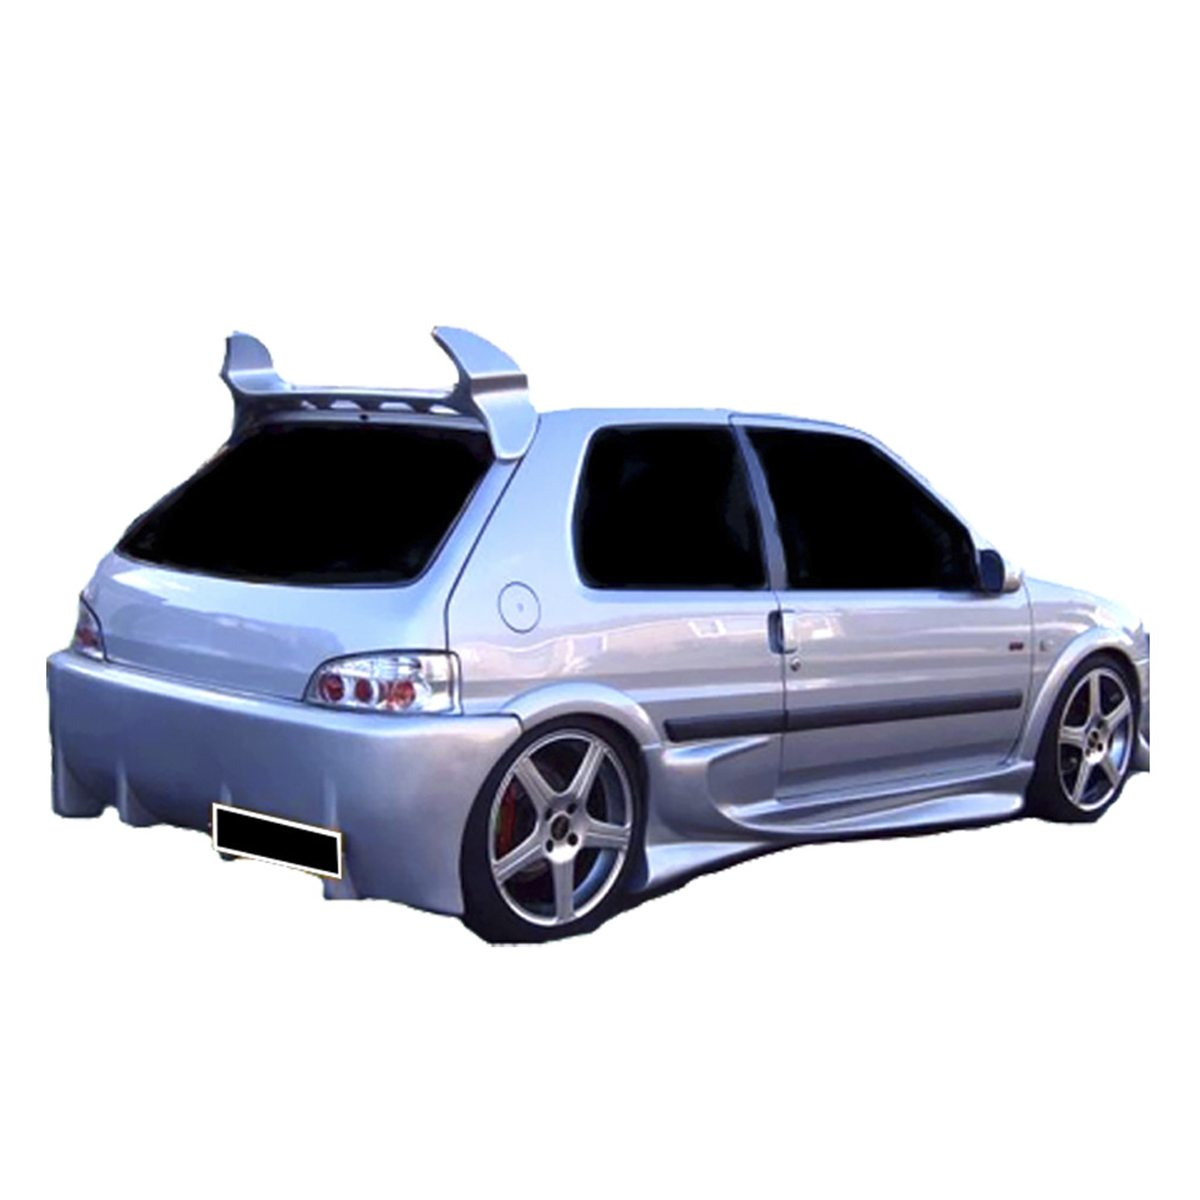 Peugeot-106-II-Super-Tras-PCM031